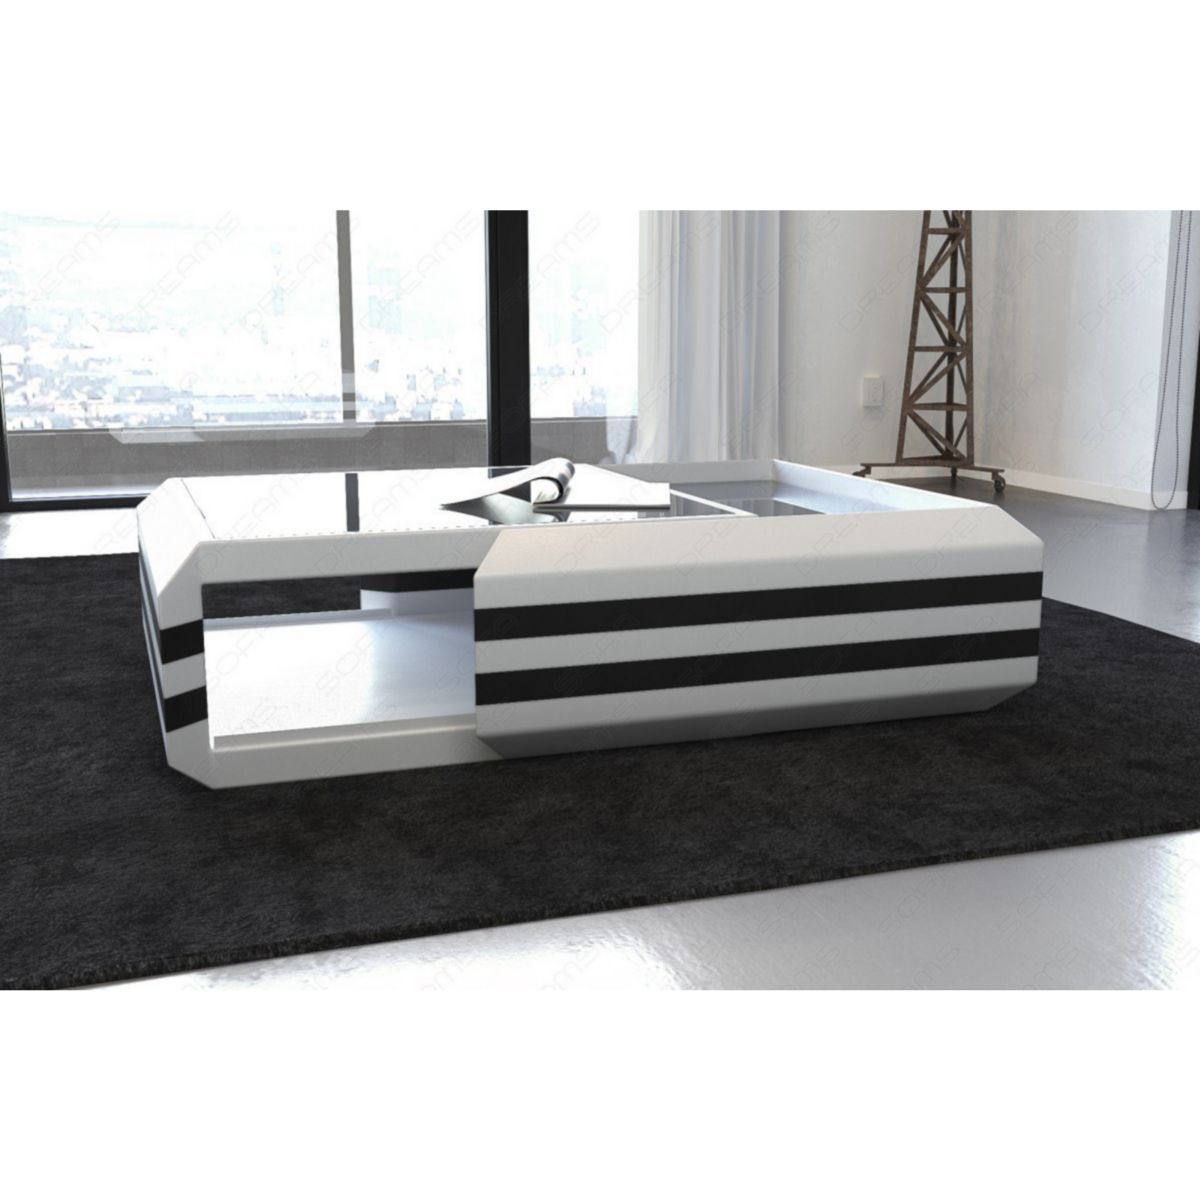 Sofa Dreams Couchtisch Ravenna